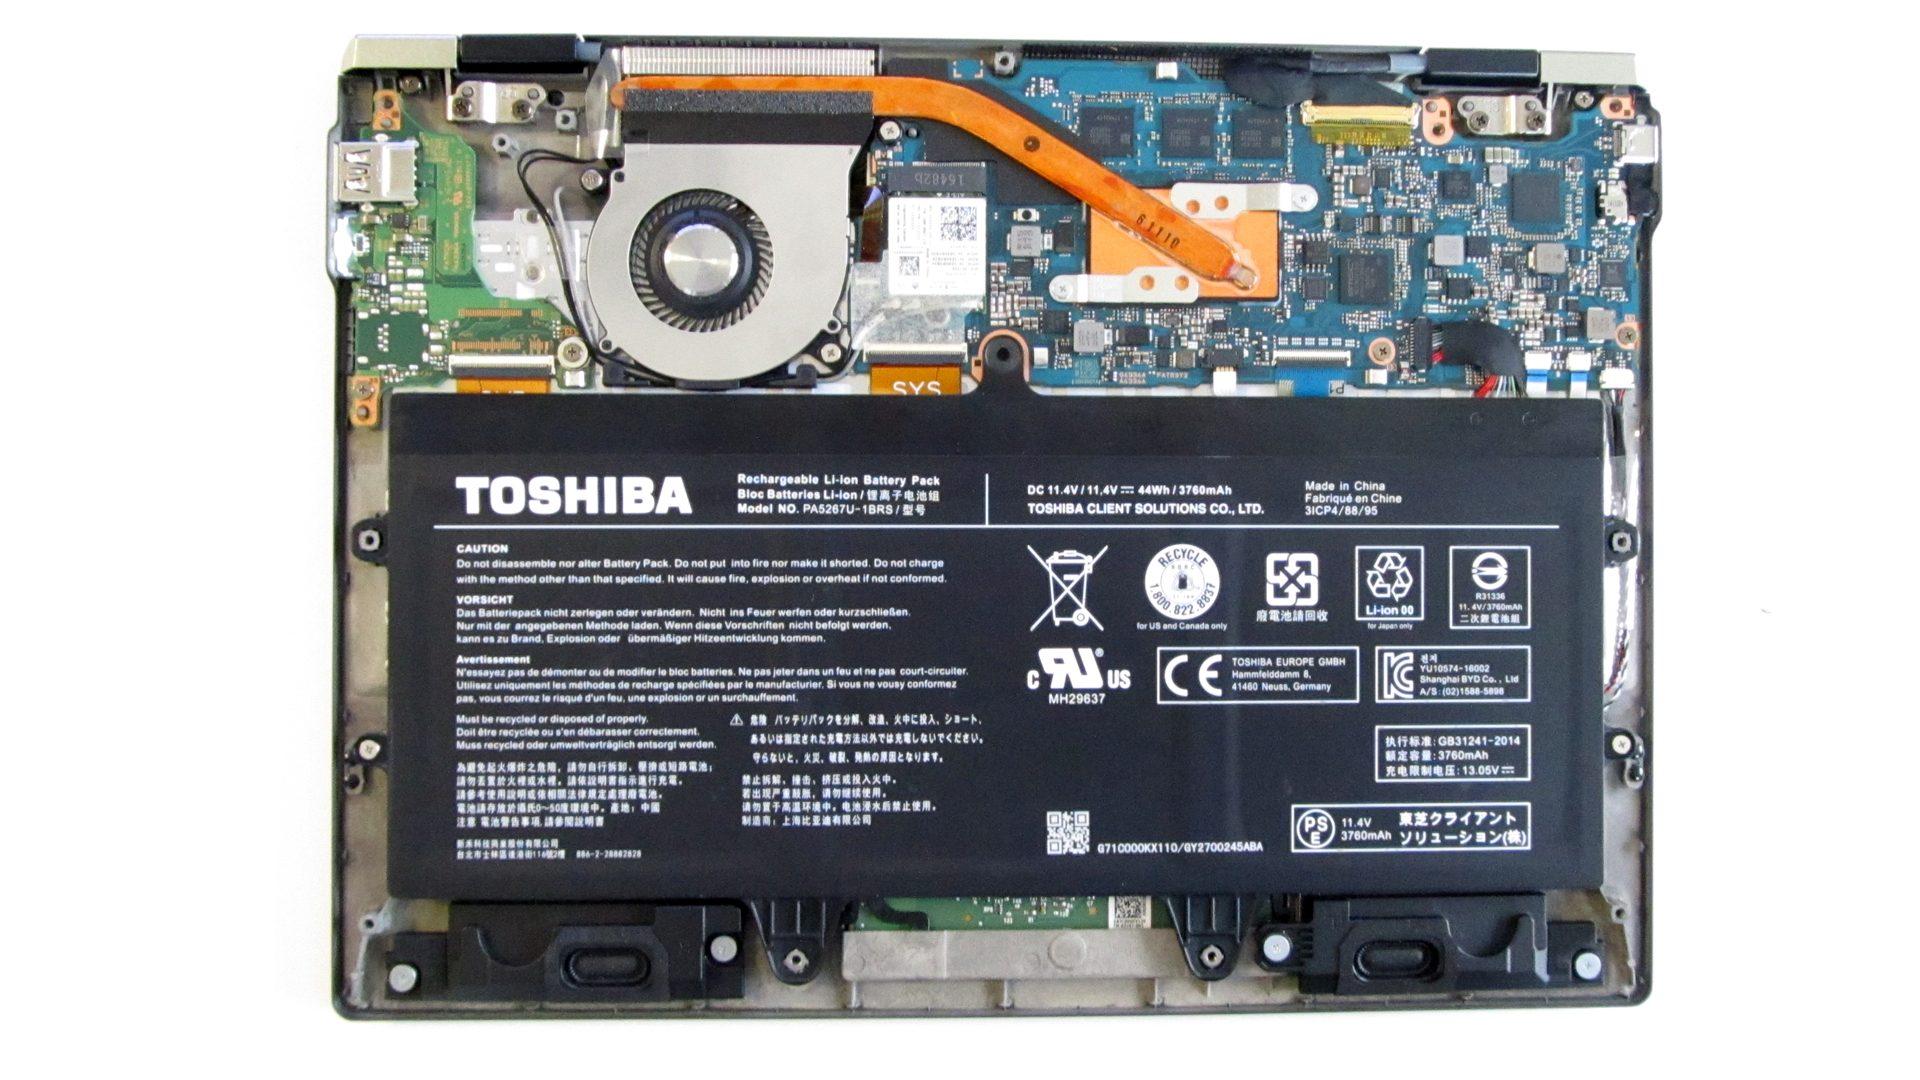 Toshiba_Portégé_X20W-D111 Innen_1